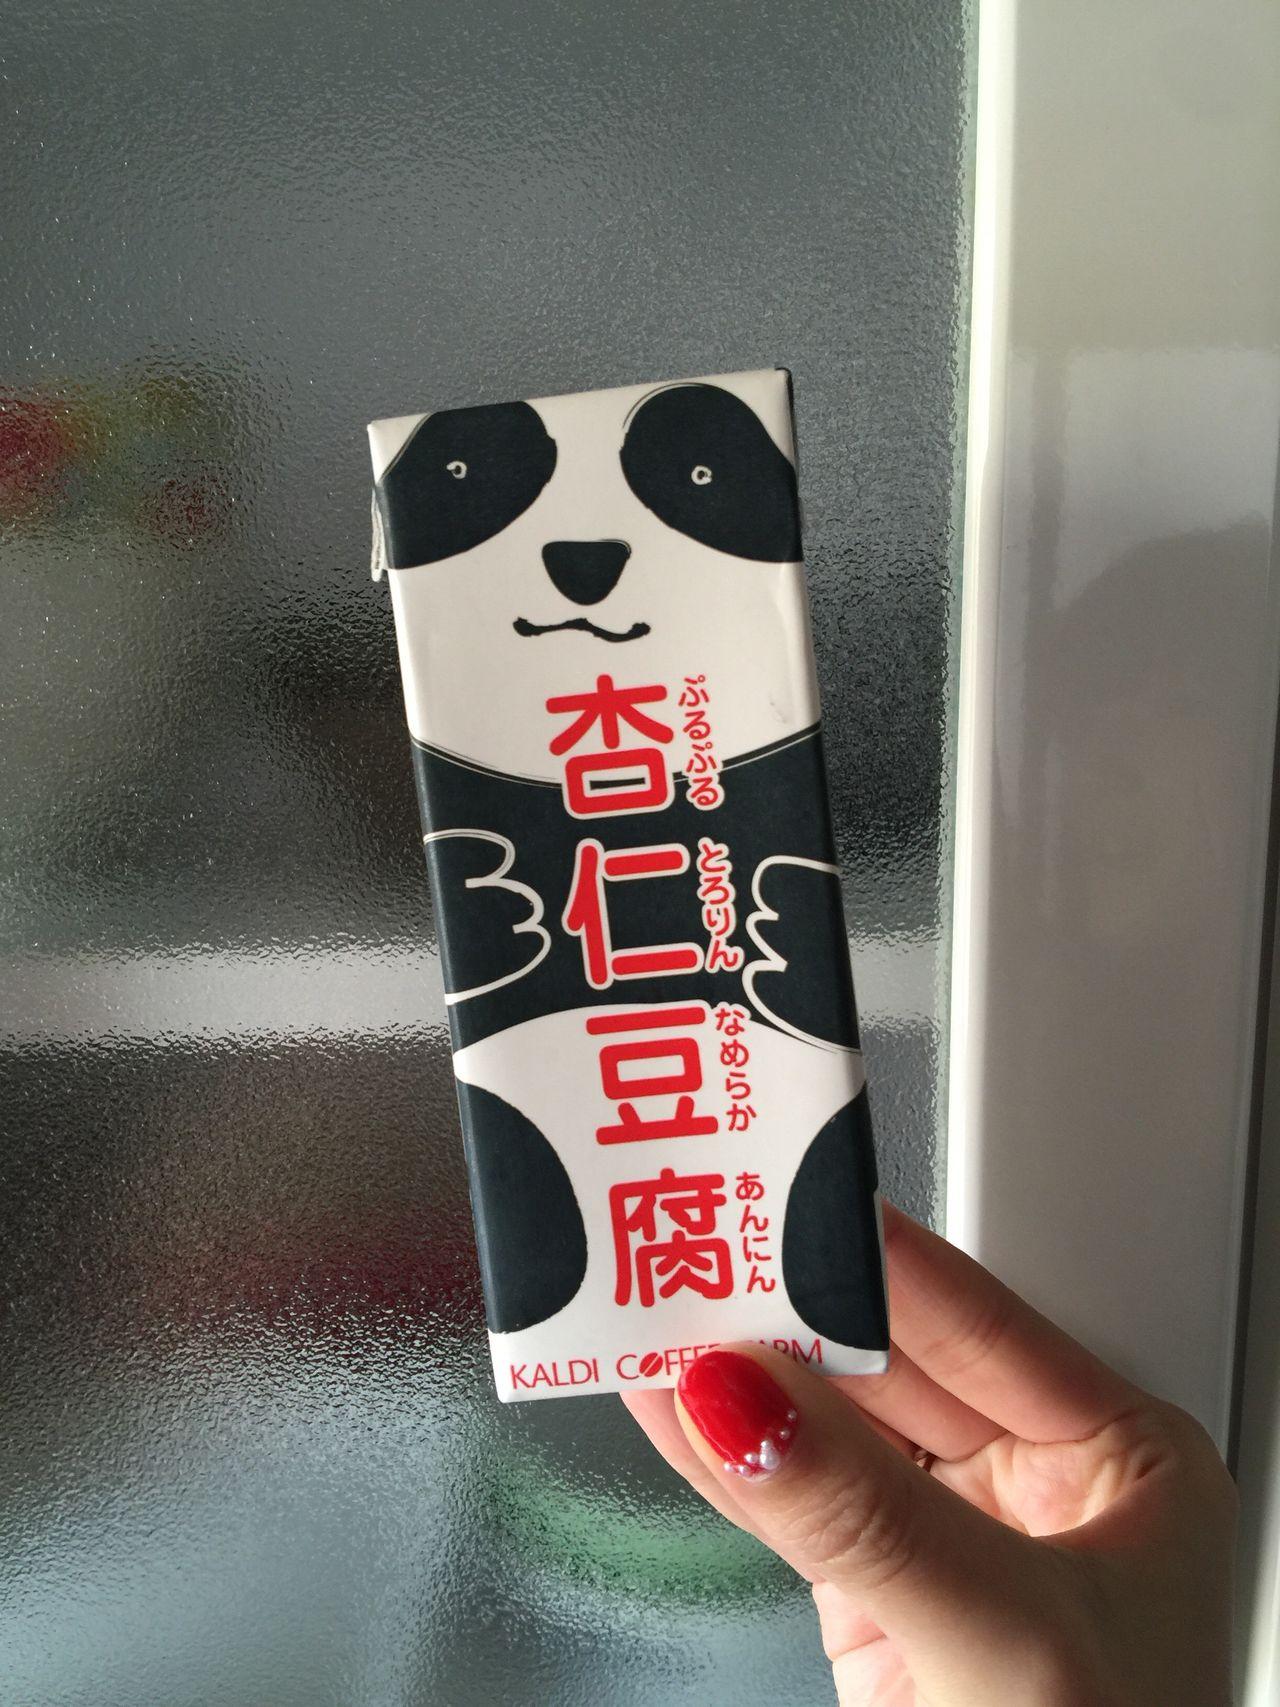 Almond Jelly KALDI カルディの杏仁豆腐